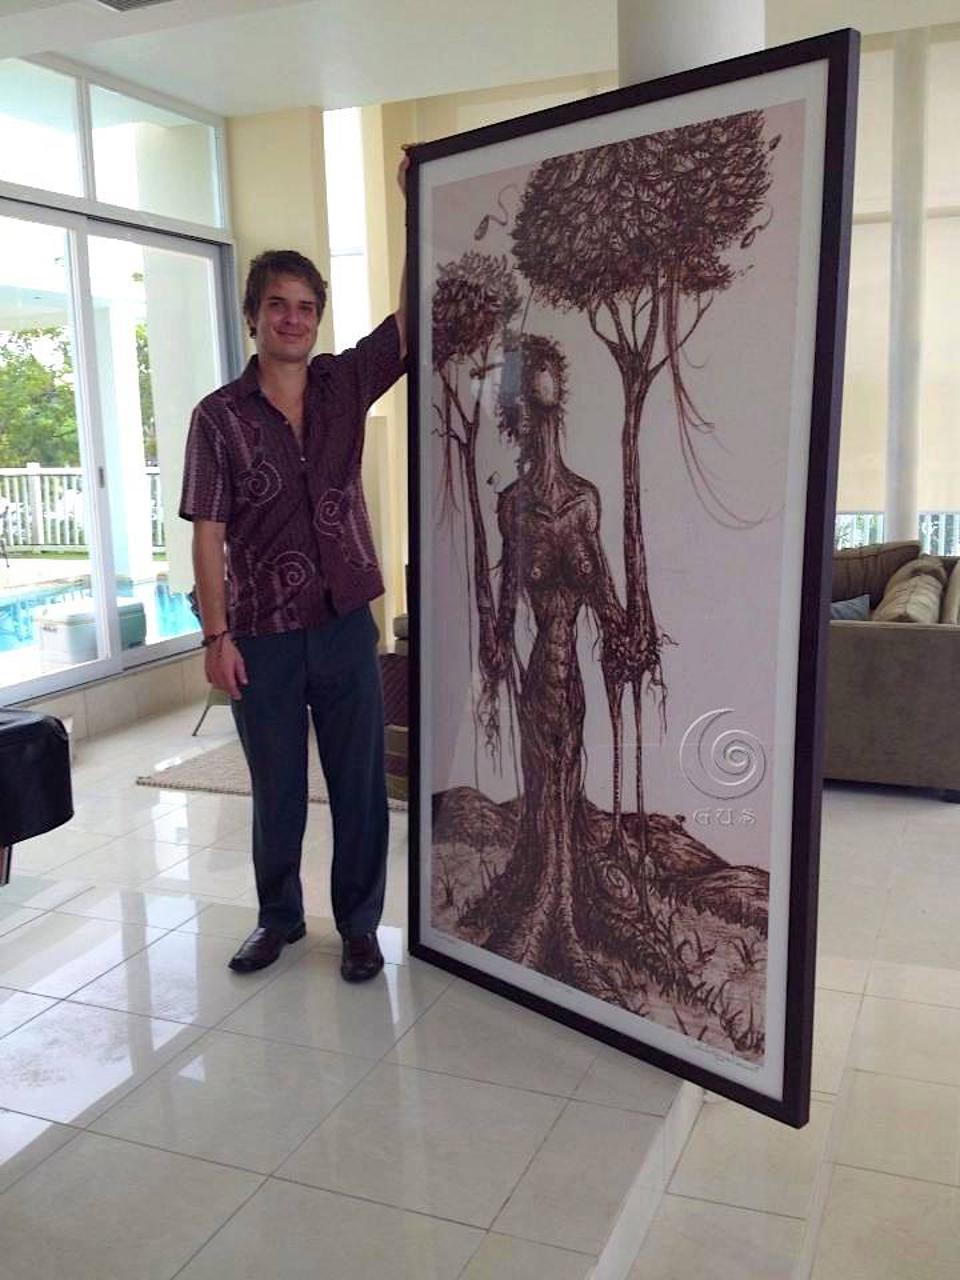 Puerto Rican artist Gustavo Adolfo